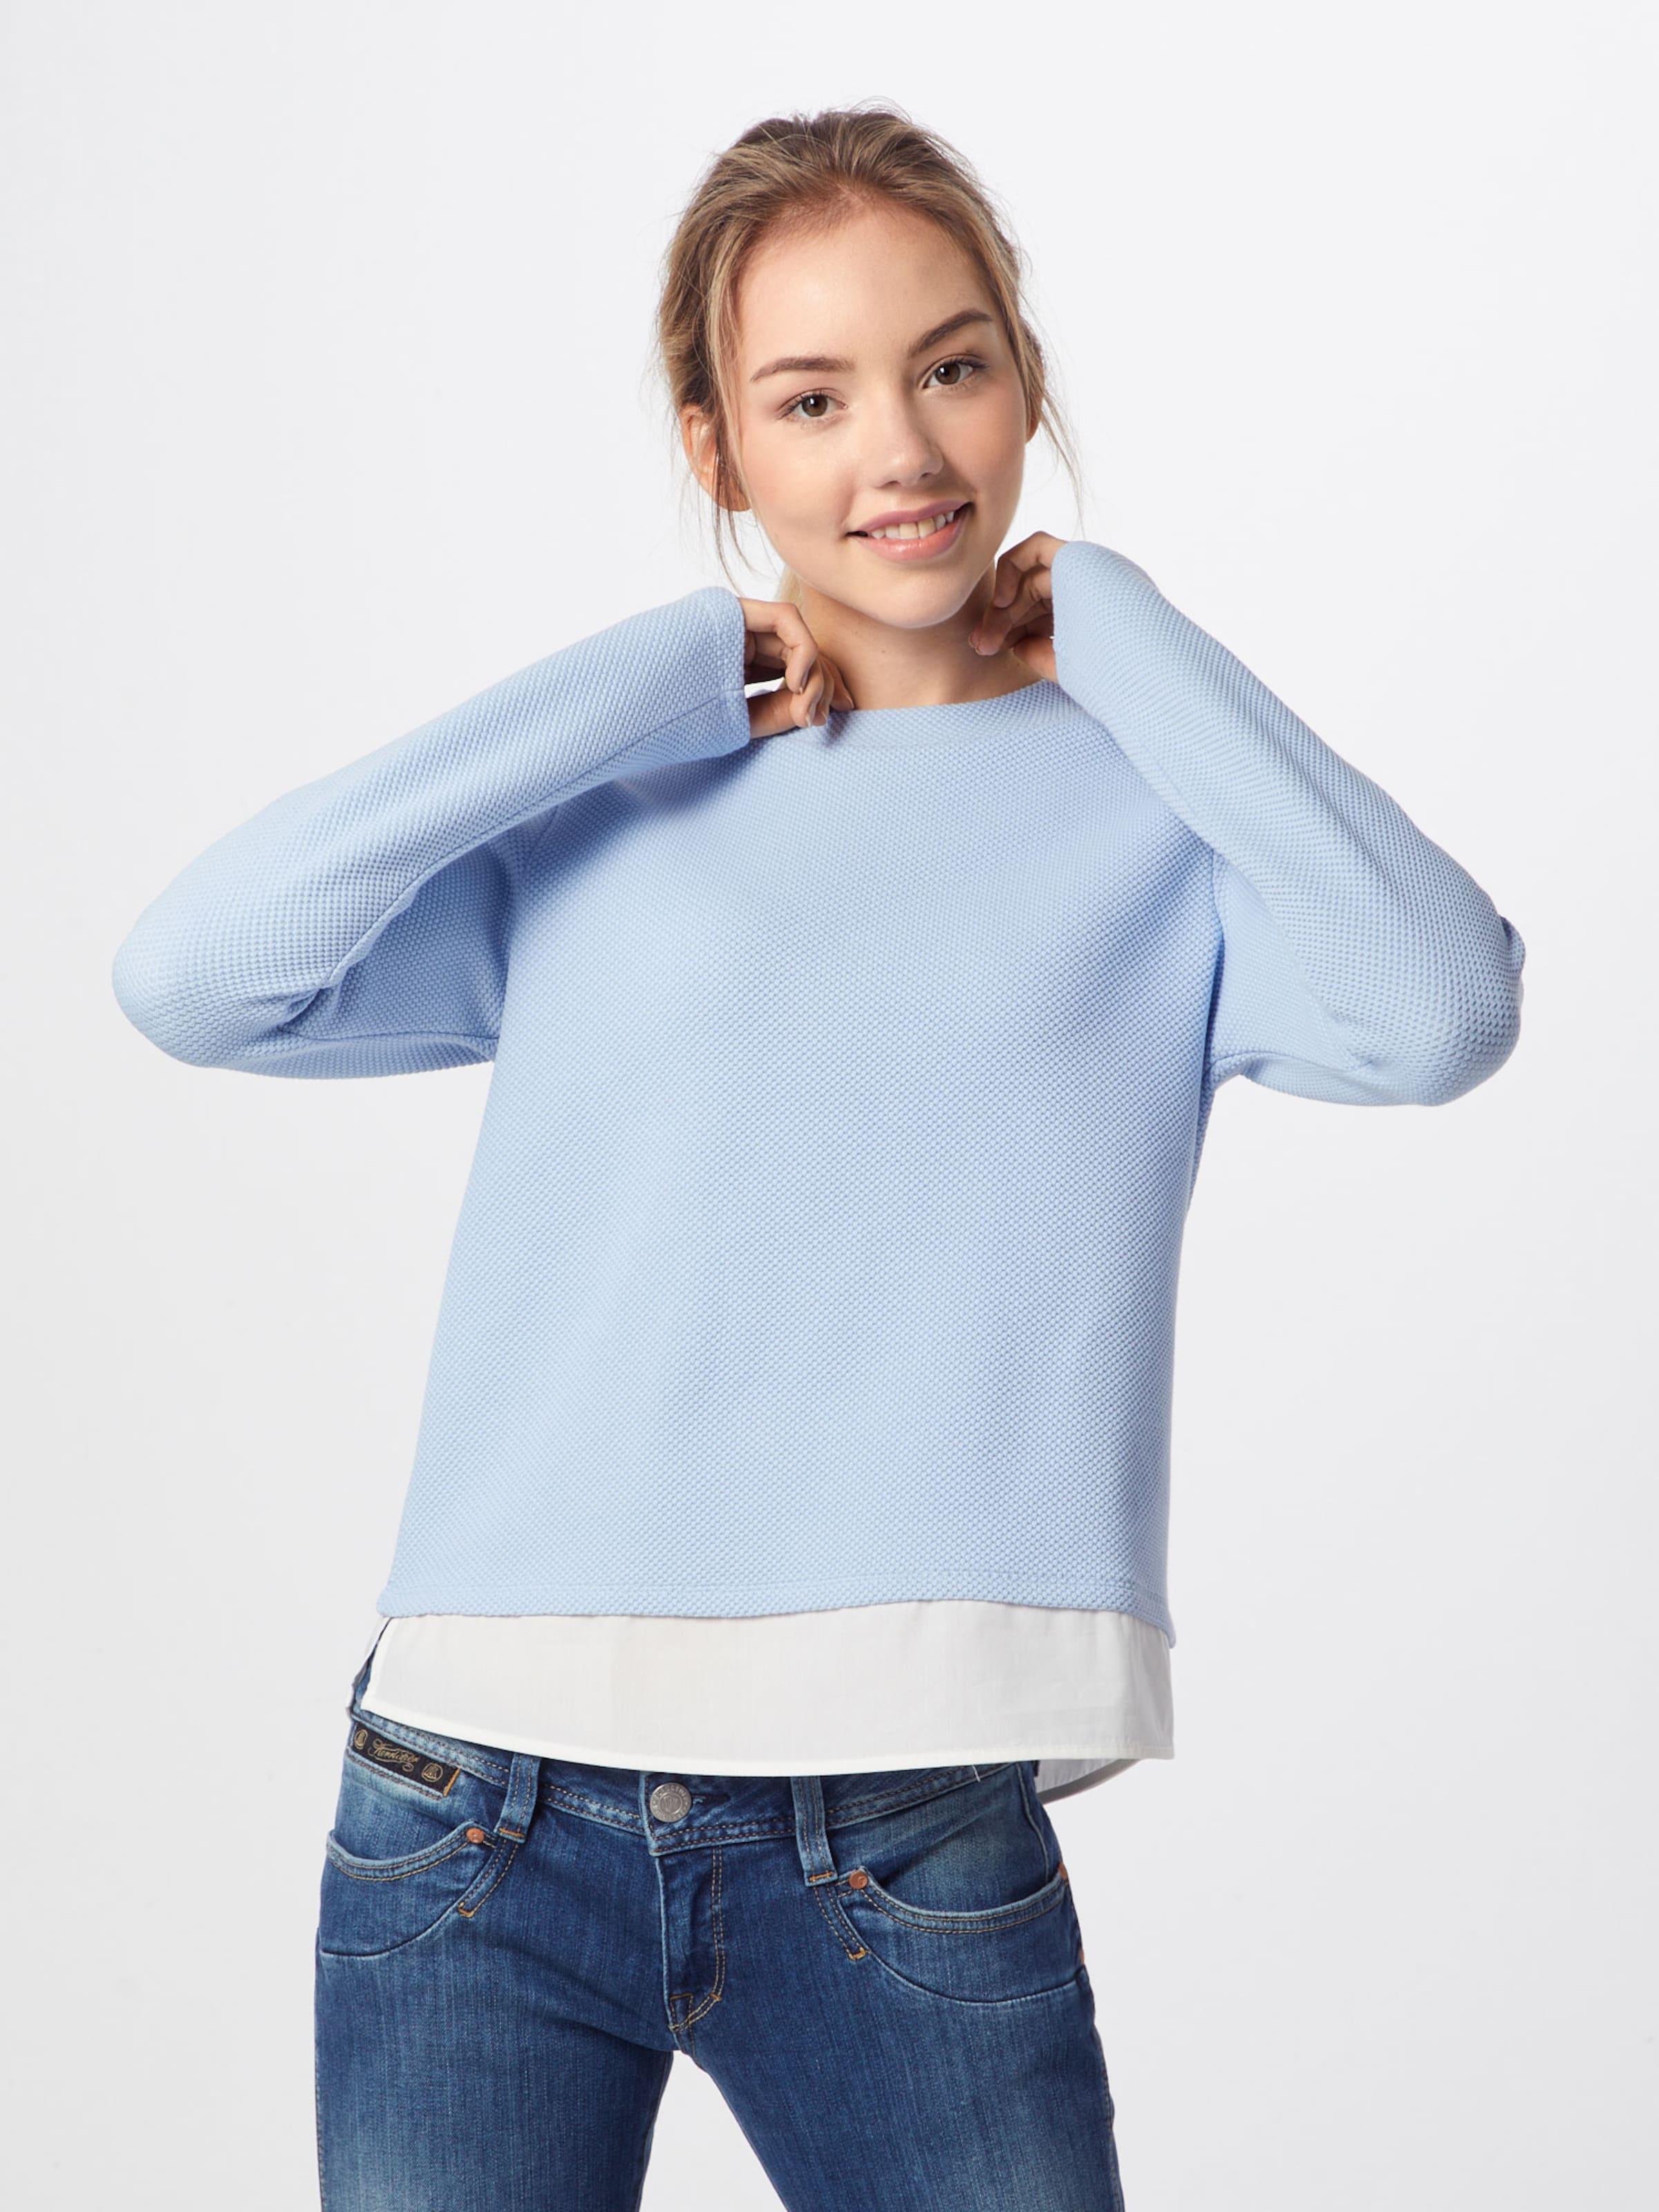 ClairBlanc oliver En Label T shirt S Red Bleu ul1cTJF3K5